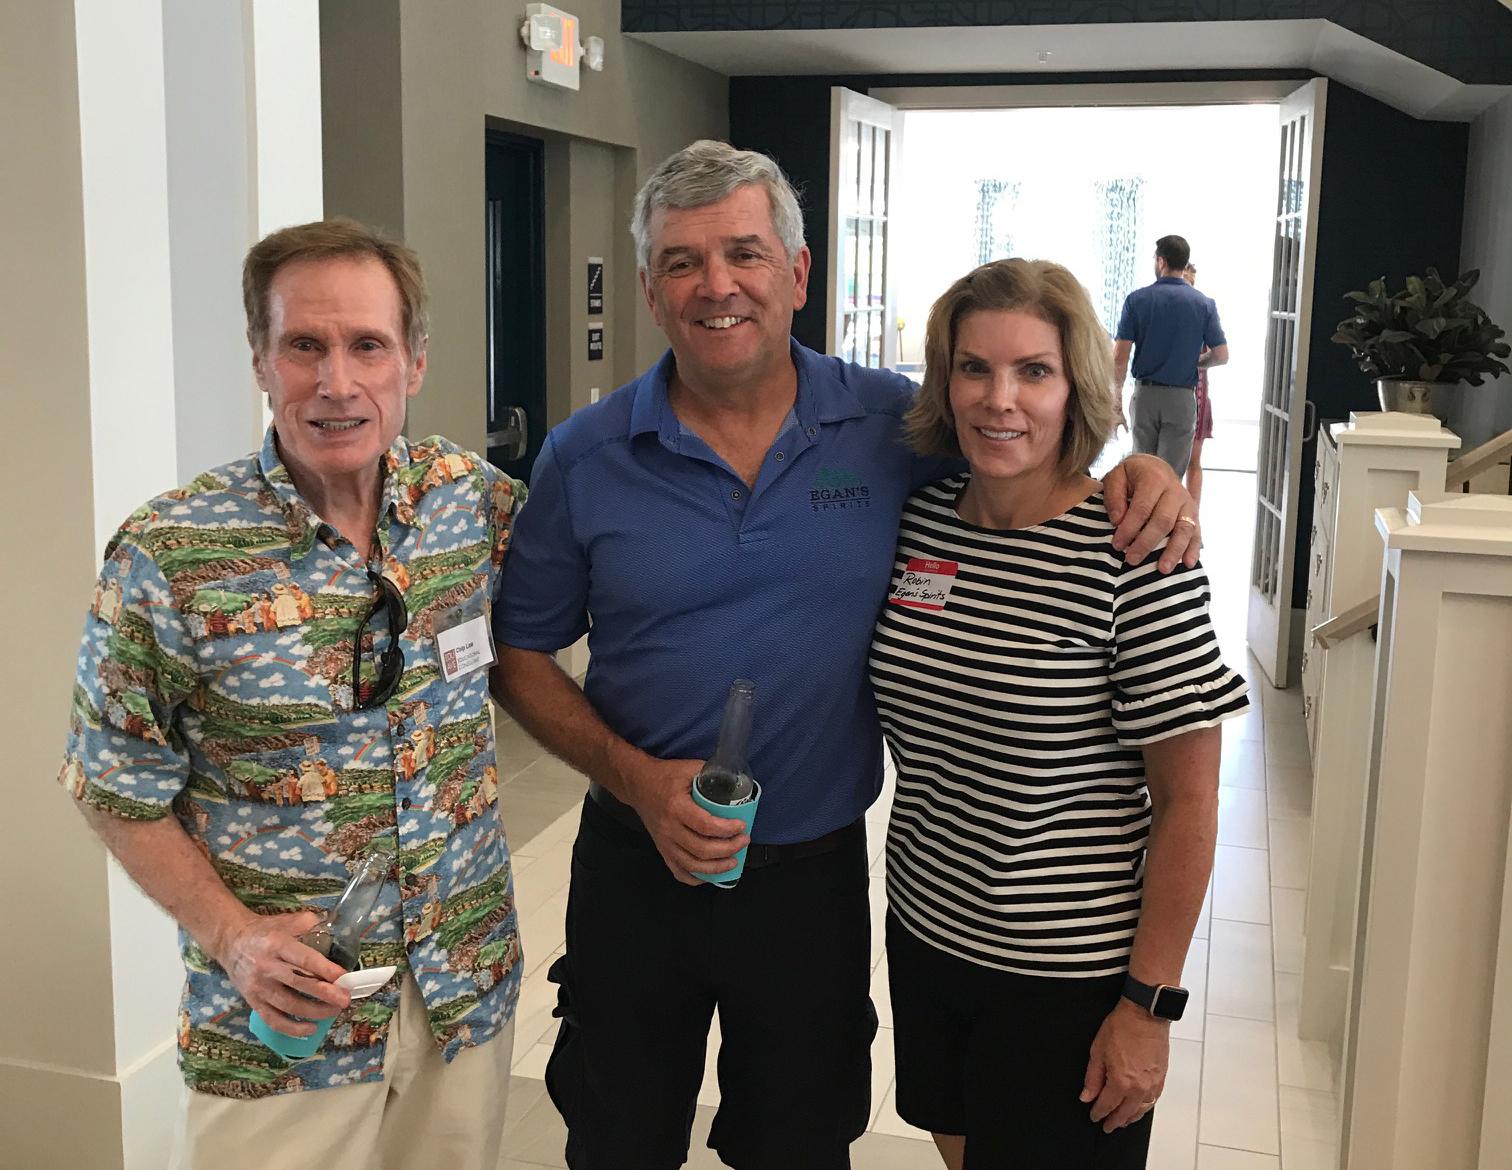 Educational Avenue's Chip Law and DIBA sponsors John Egan and Robin Rodriguez of Egan's Spirits.